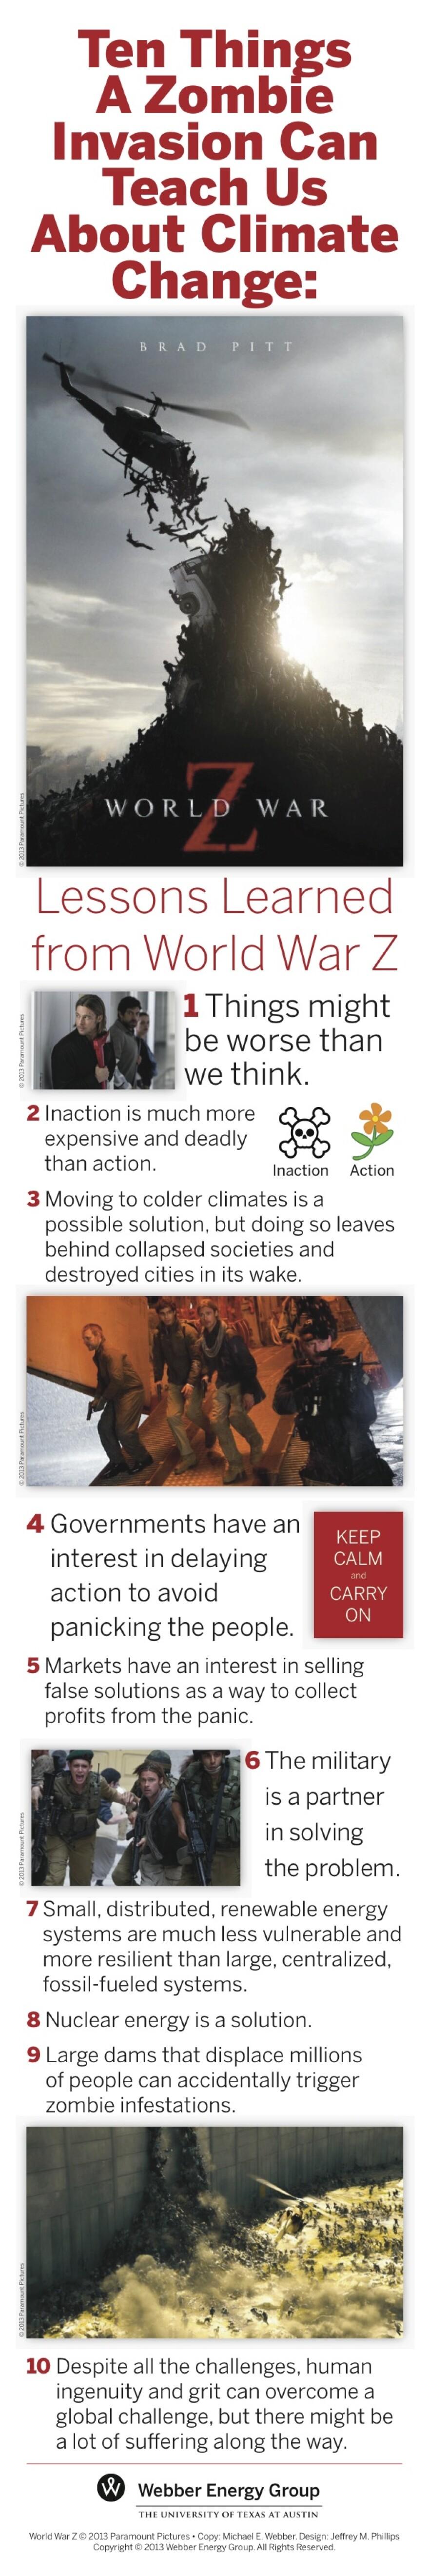 Zombies_Infographic[4]_copy_2.jpg